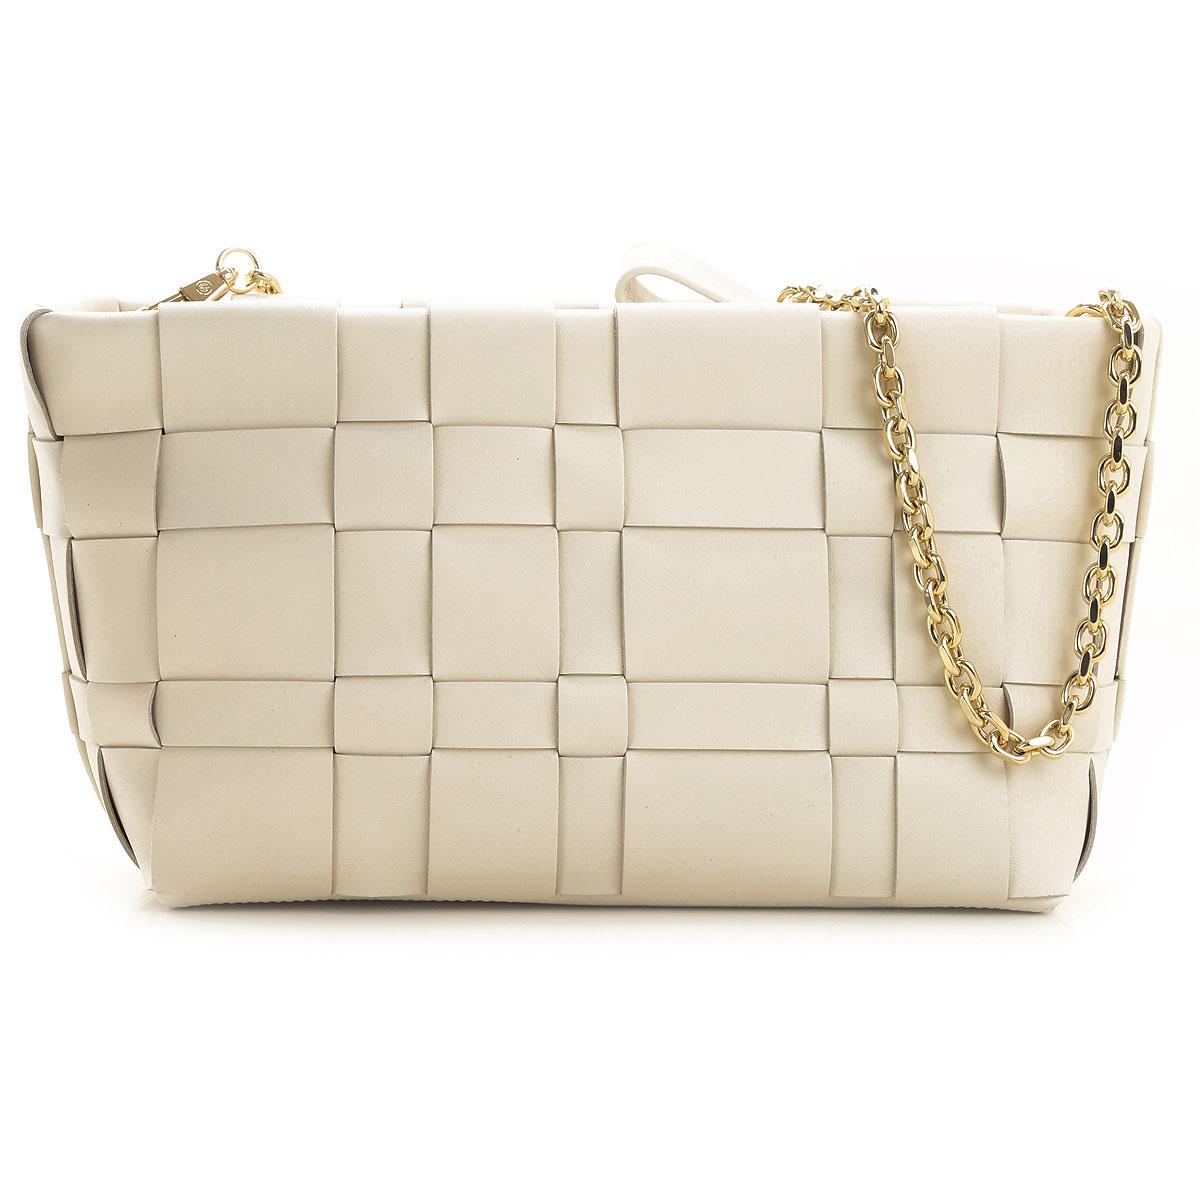 3.1 PHILLIP LIM Shoulder Bag for Women On Sale, White, Leather, 2019